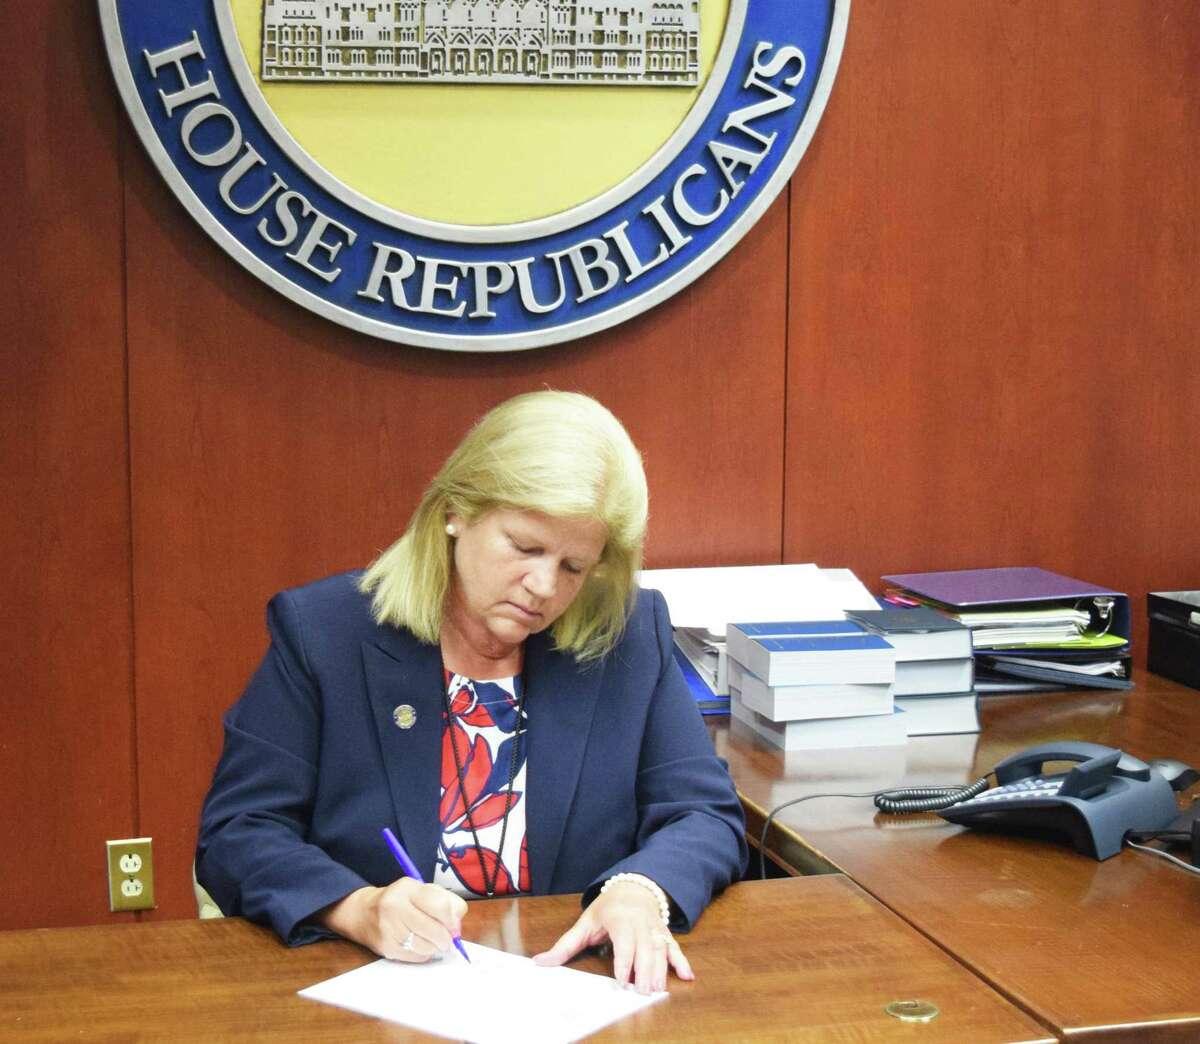 State Rep. Irene Haines, R-East Haddam